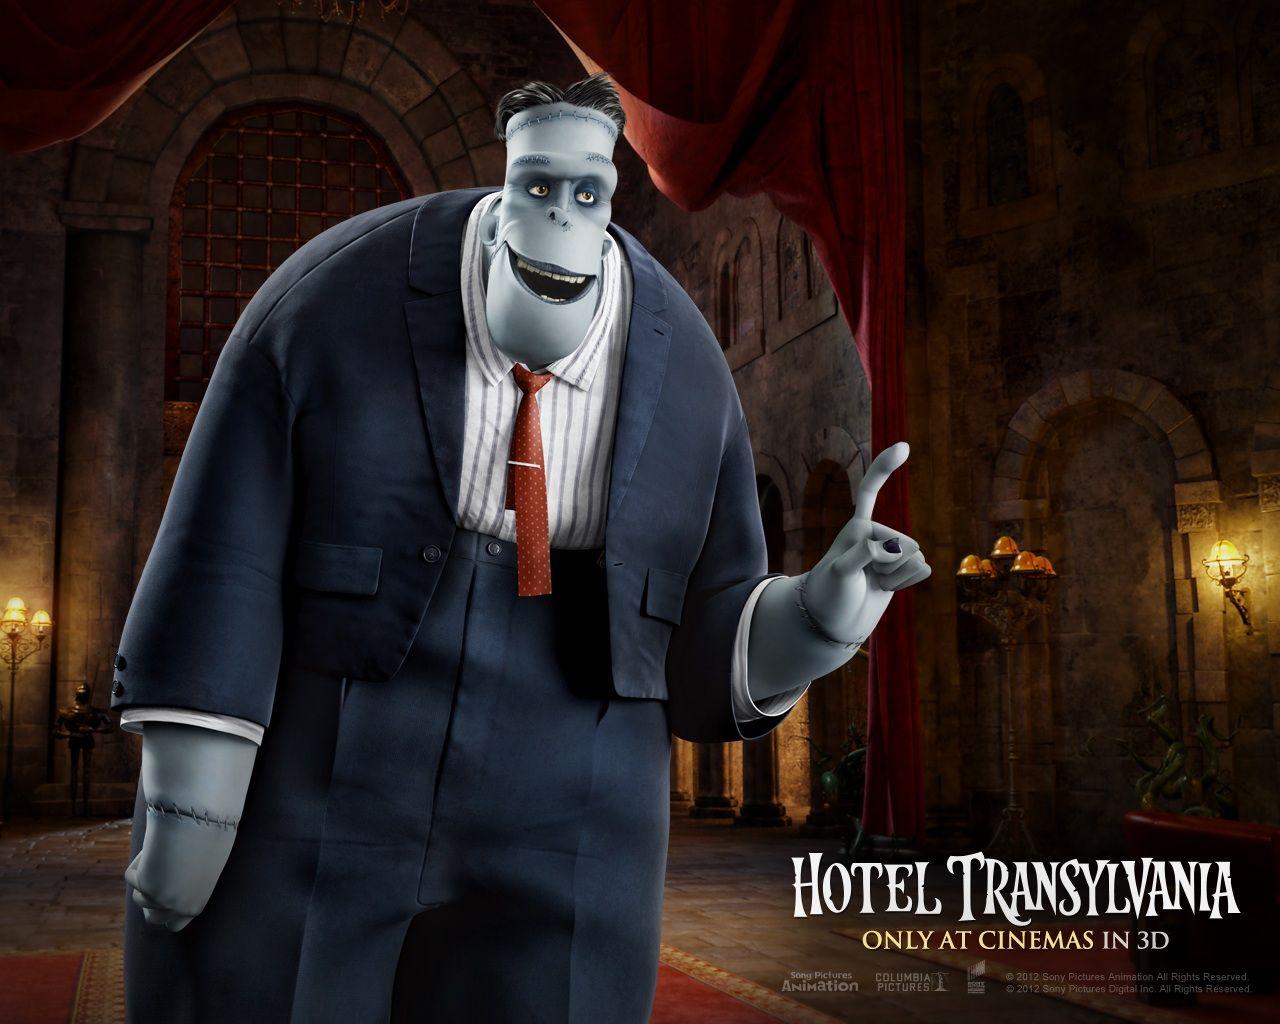 Frankenstein Hotel Transylvania With Images Hotel Transylvania